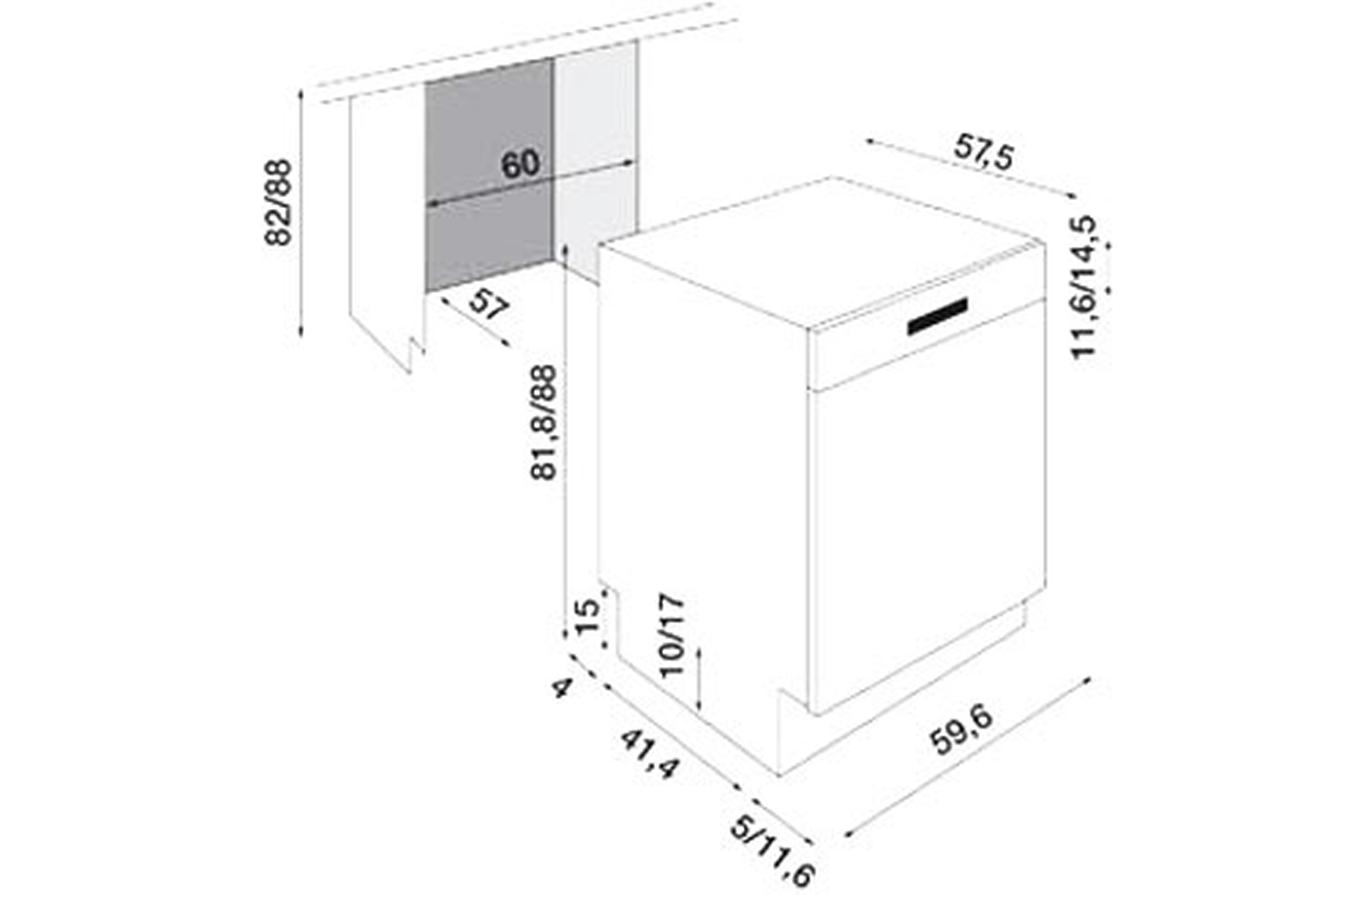 lave vaisselle encastrable electrolux asi 64010 x bandeau. Black Bedroom Furniture Sets. Home Design Ideas